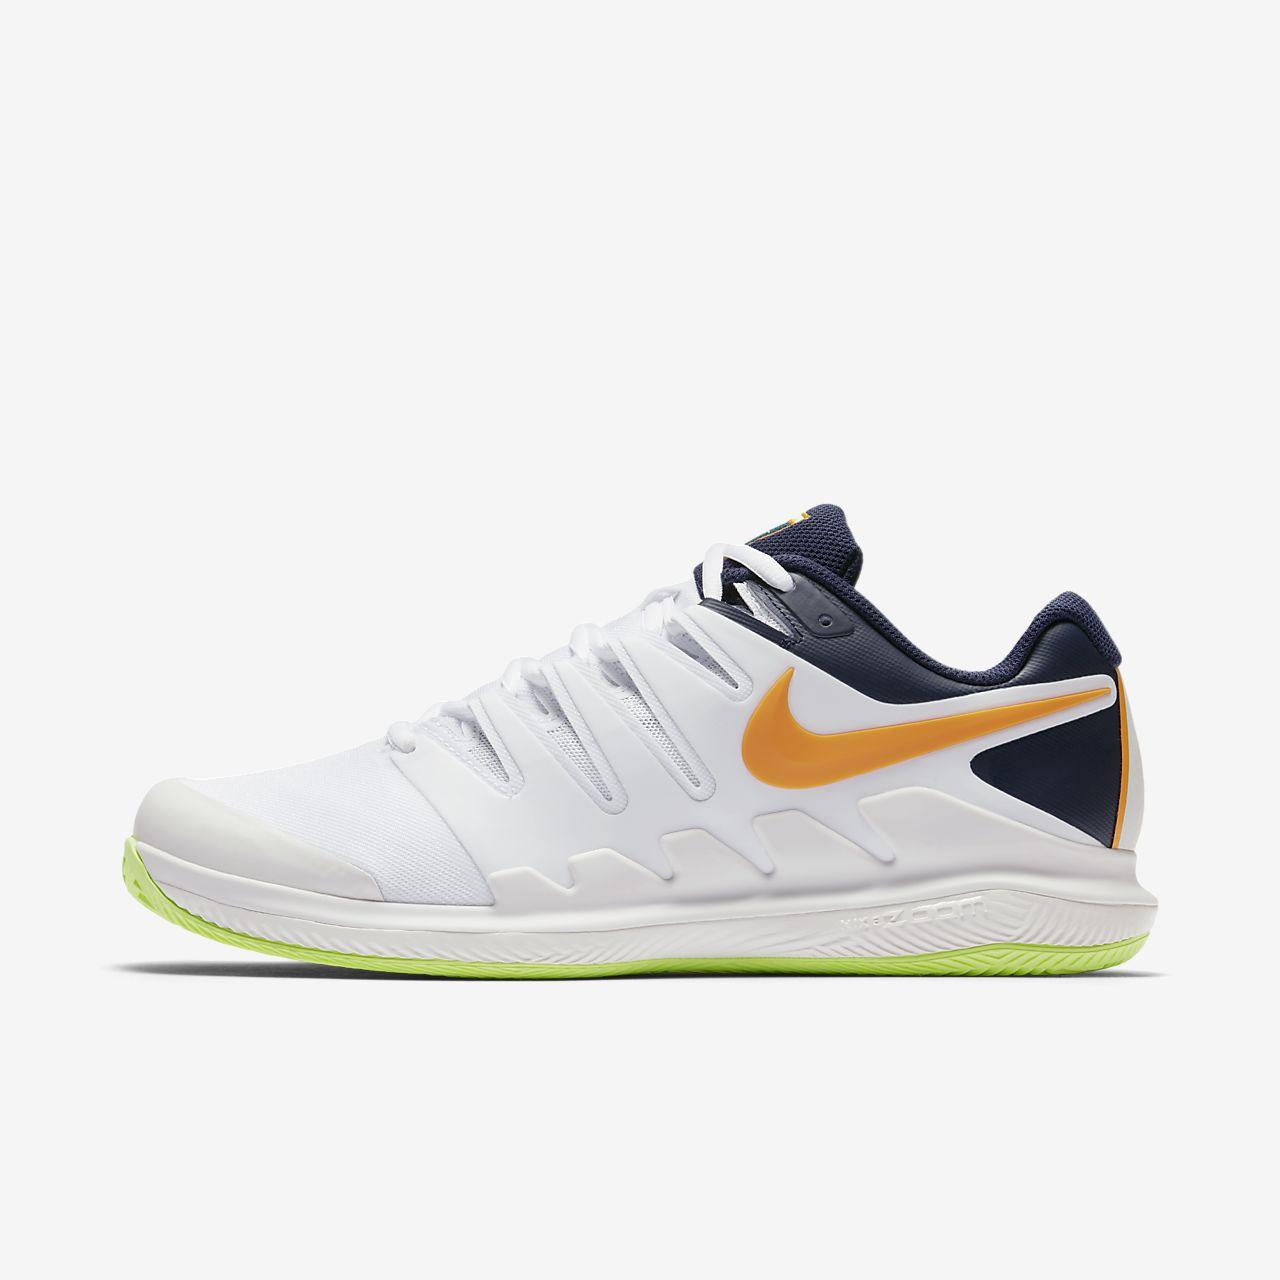 scarpe tennis nike clay